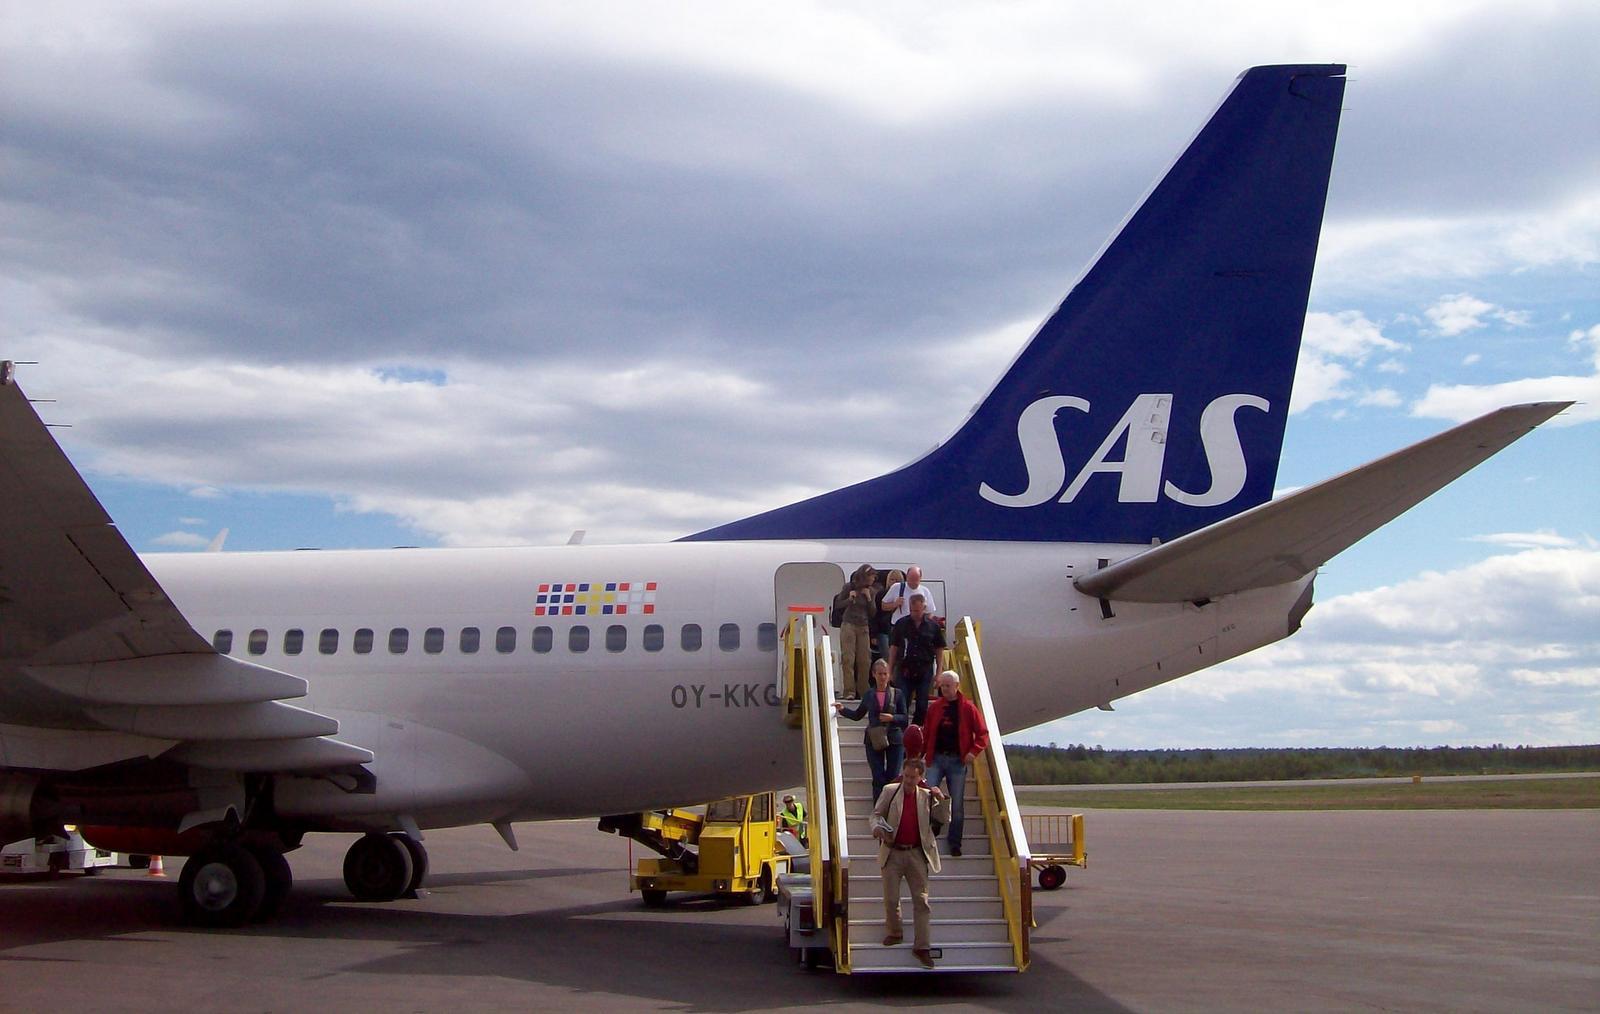 SAS-Flugzeug in Kiruna - Lappland